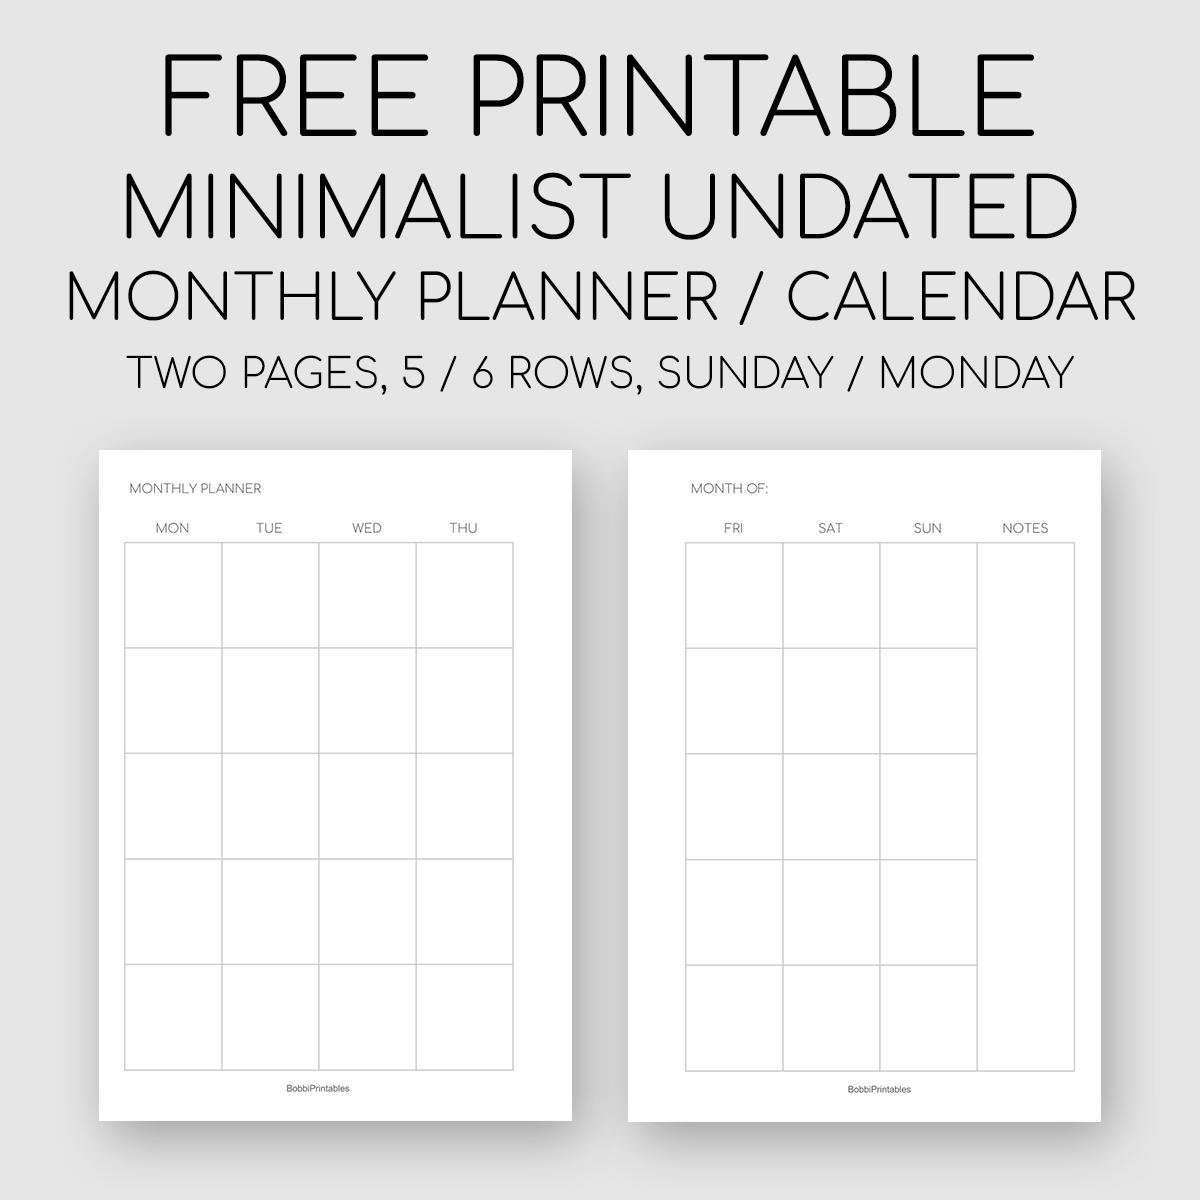 Free Printable Minimalist Monthly Planner / Undated Calendar